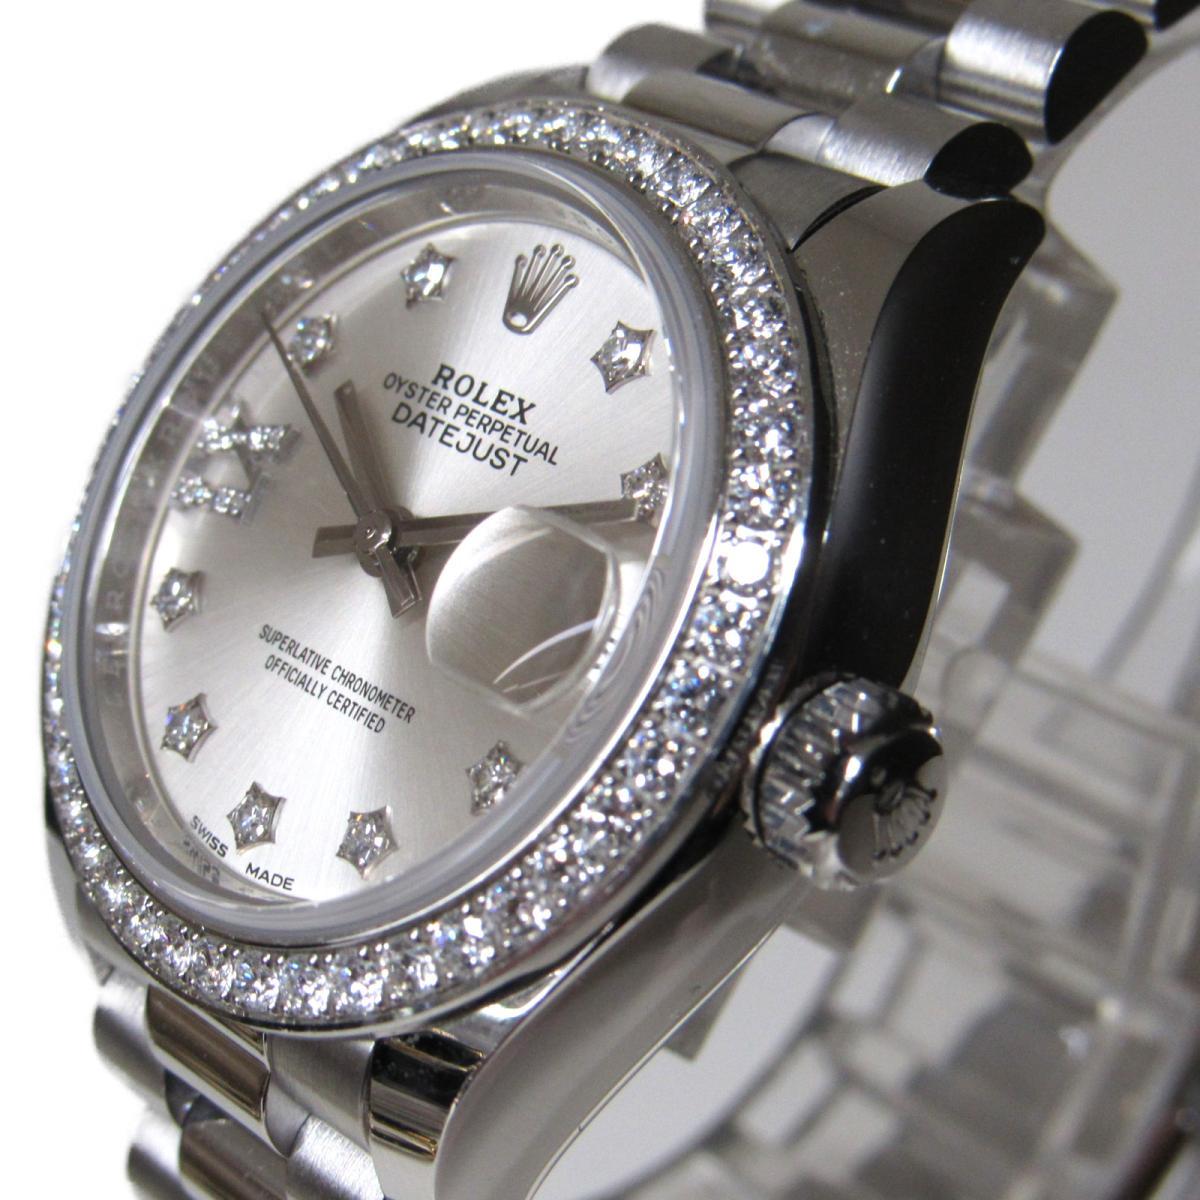 ROLEX 時計 279136 デイトジャスト ダイヤモンドベゼル 腕時計/レディース